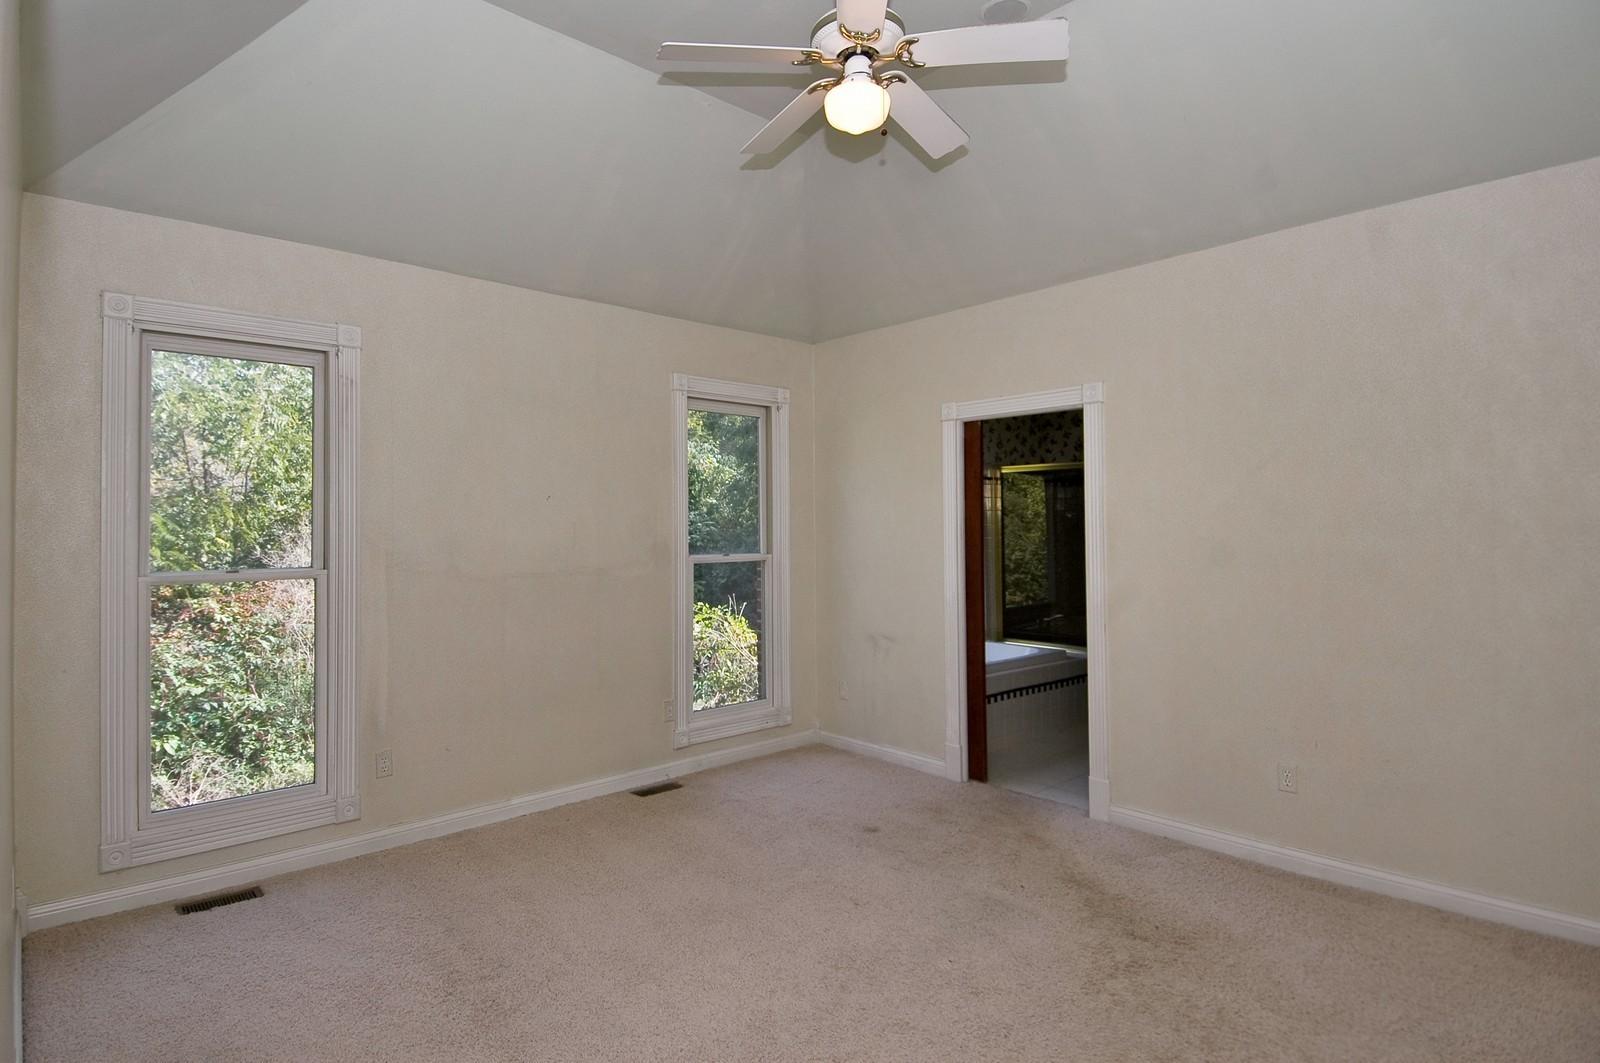 Real Estate Photography - 644 Oakland Dr, Dekalb, IL, 60115 - Master Bedroom